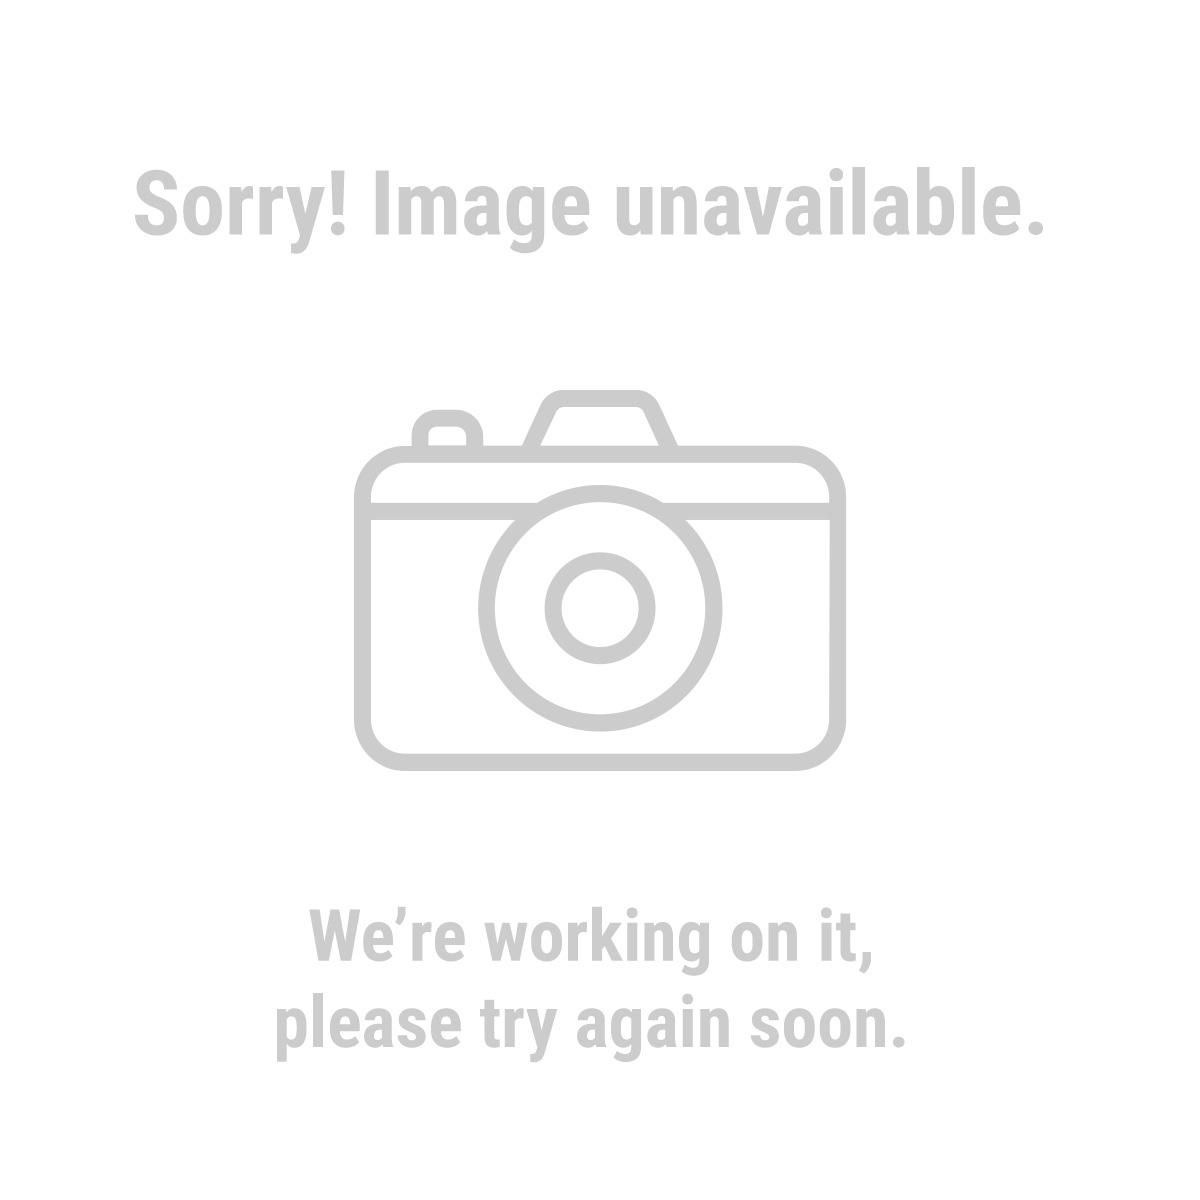 Drill Master 98622 Palm Detail Sander